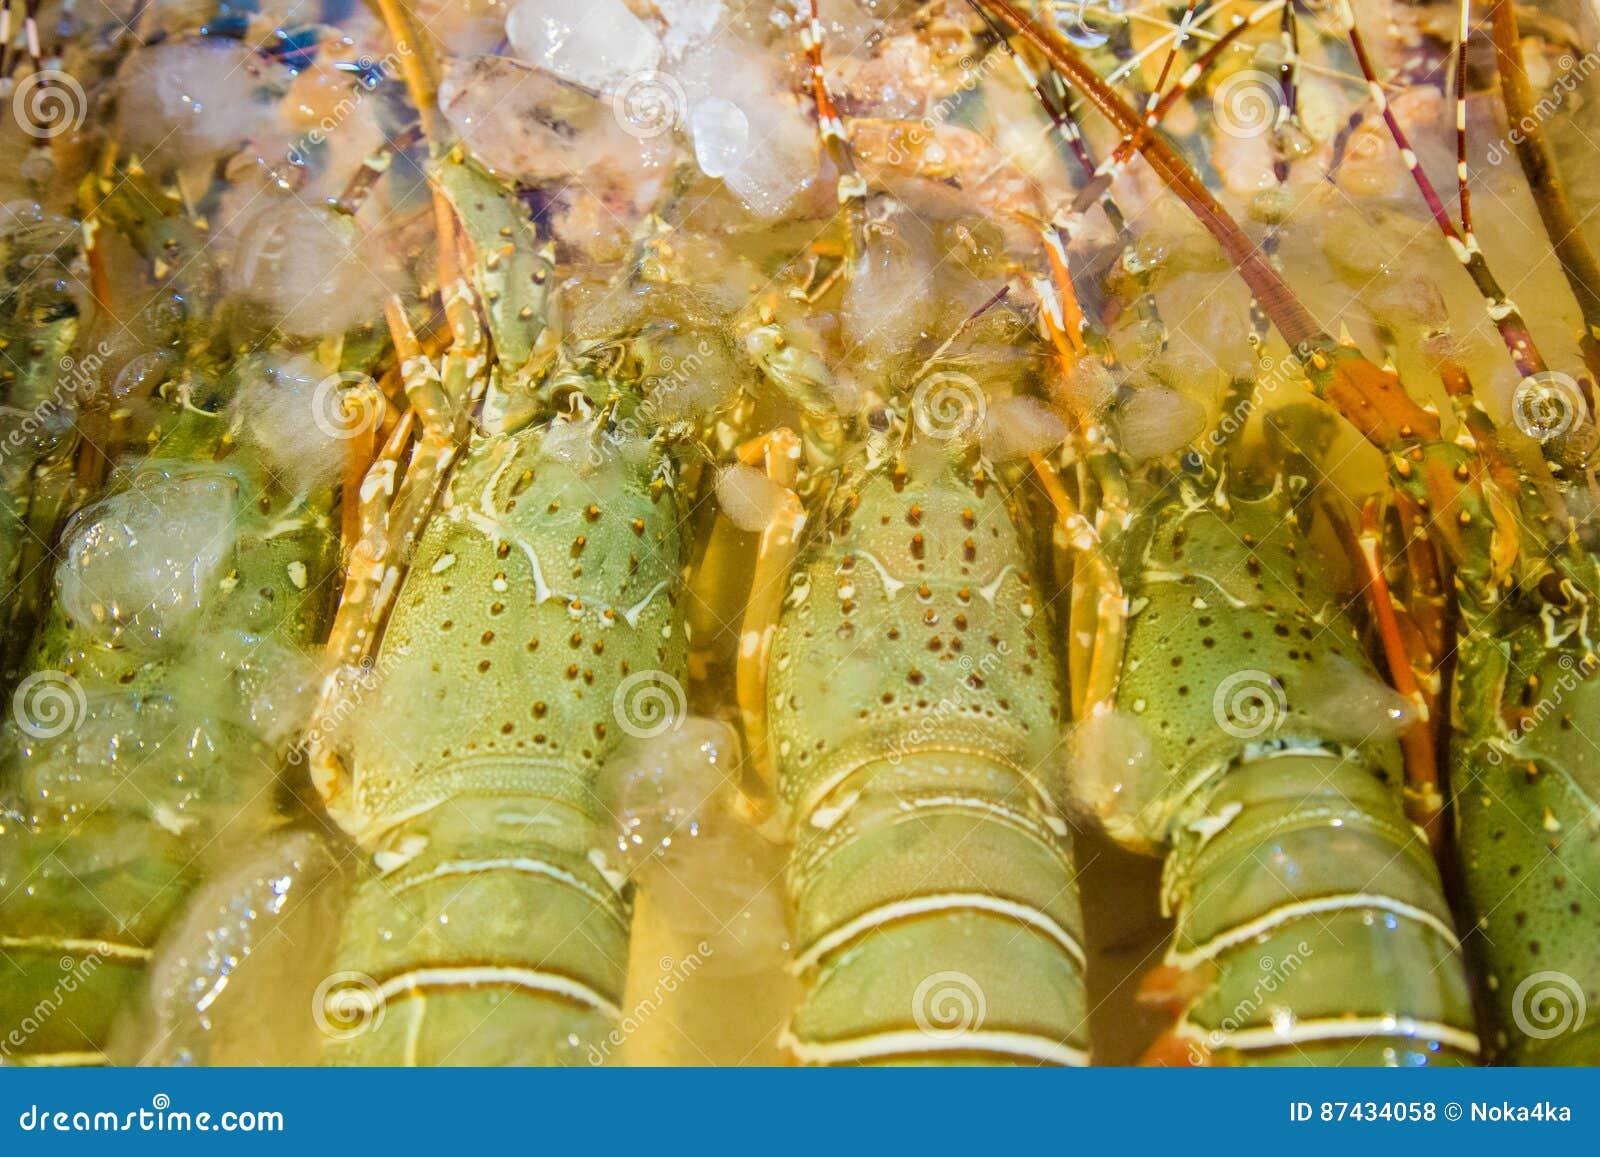 Fresh crawfish in the Asian market